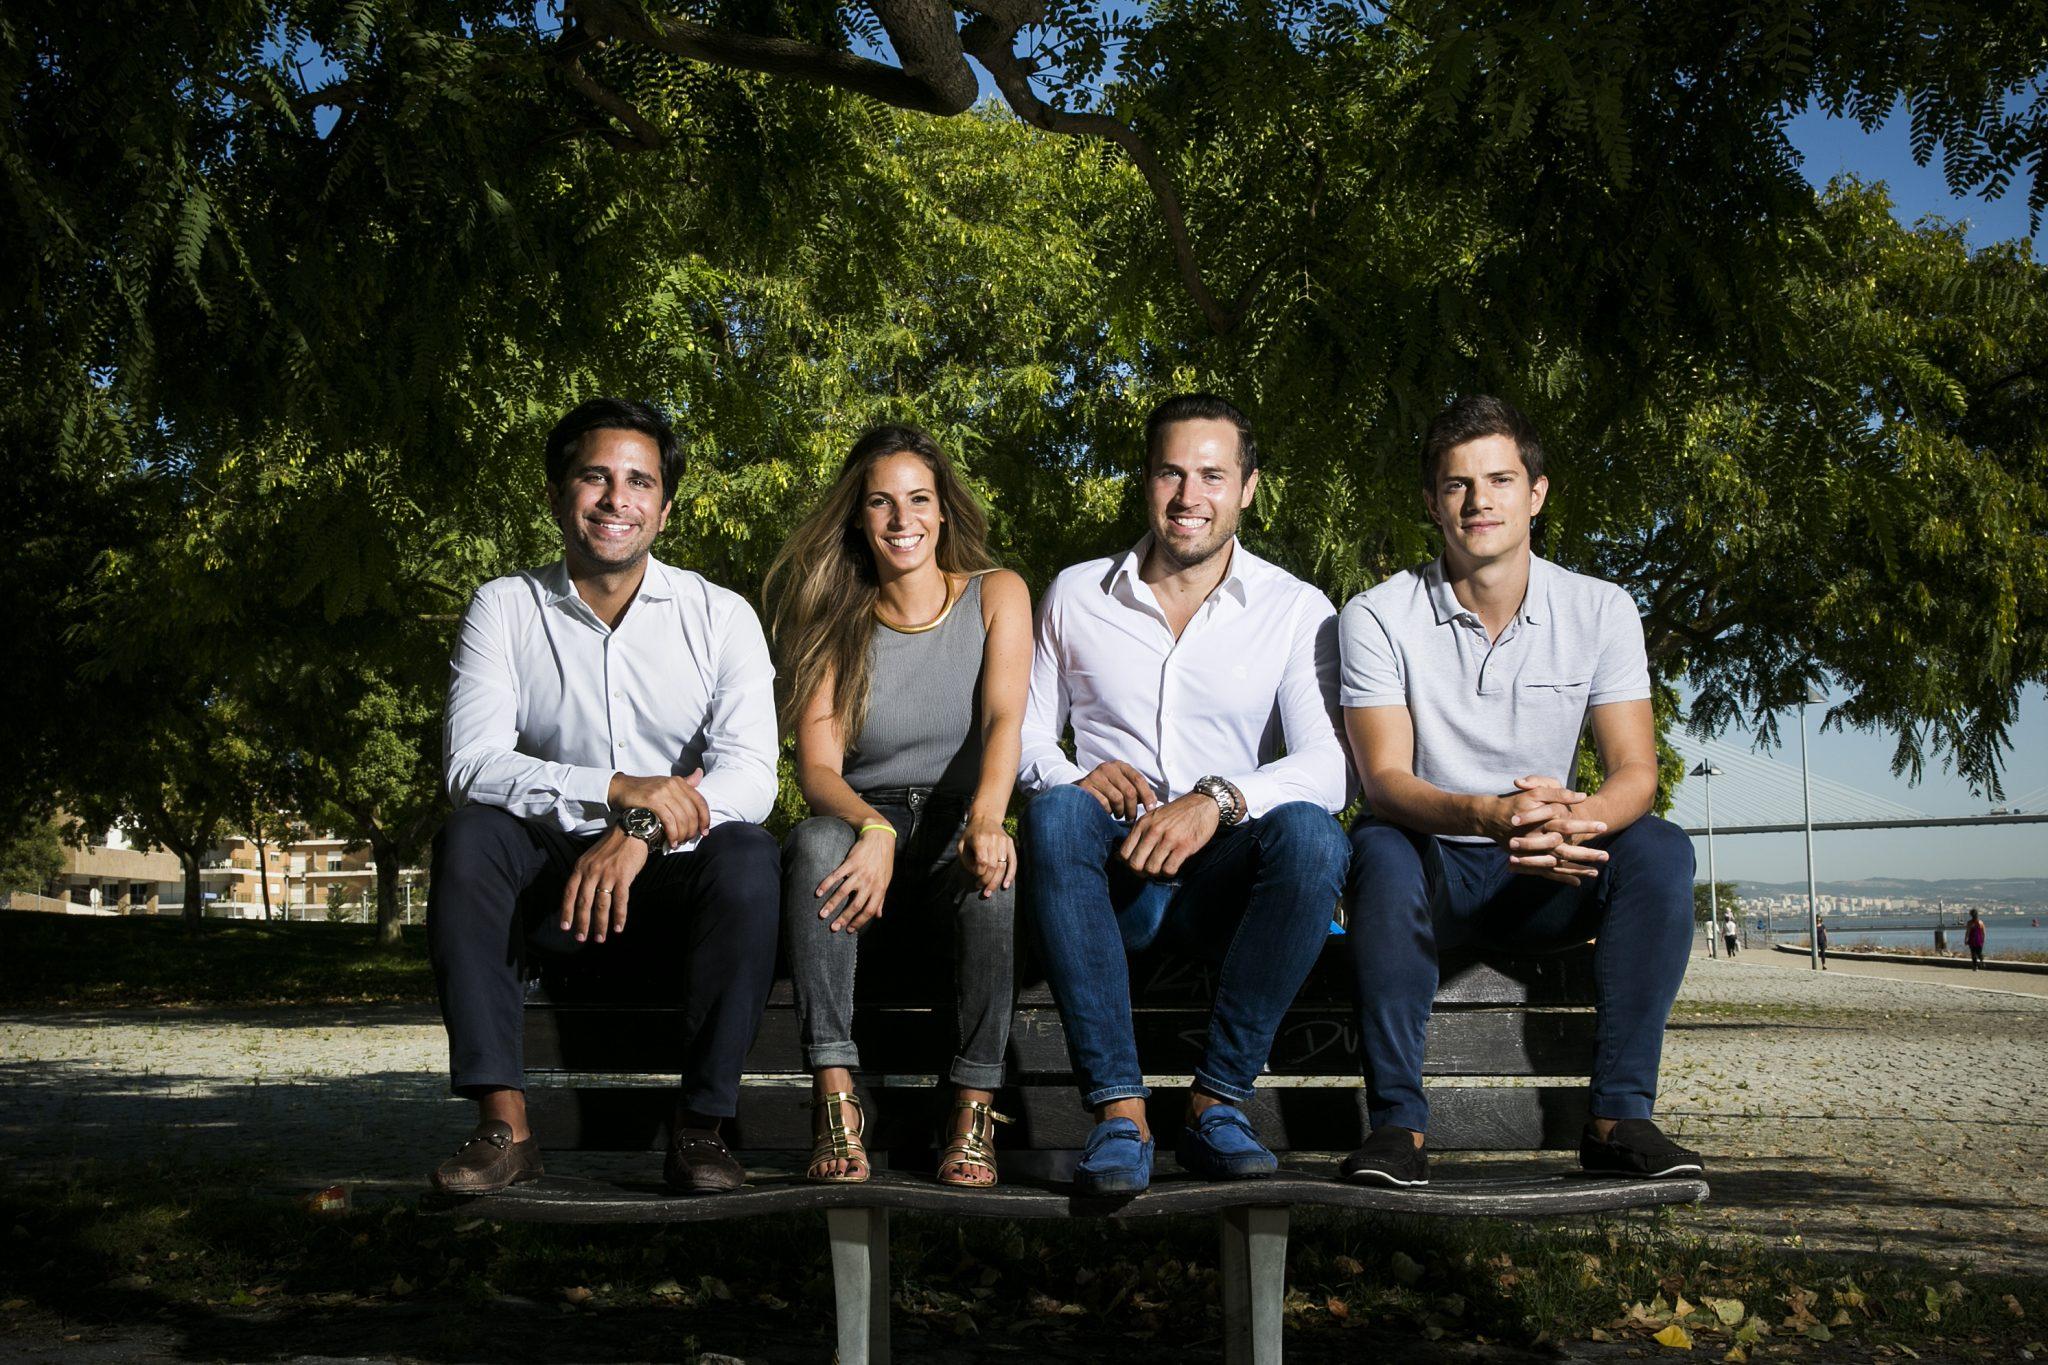 StudentFinance team